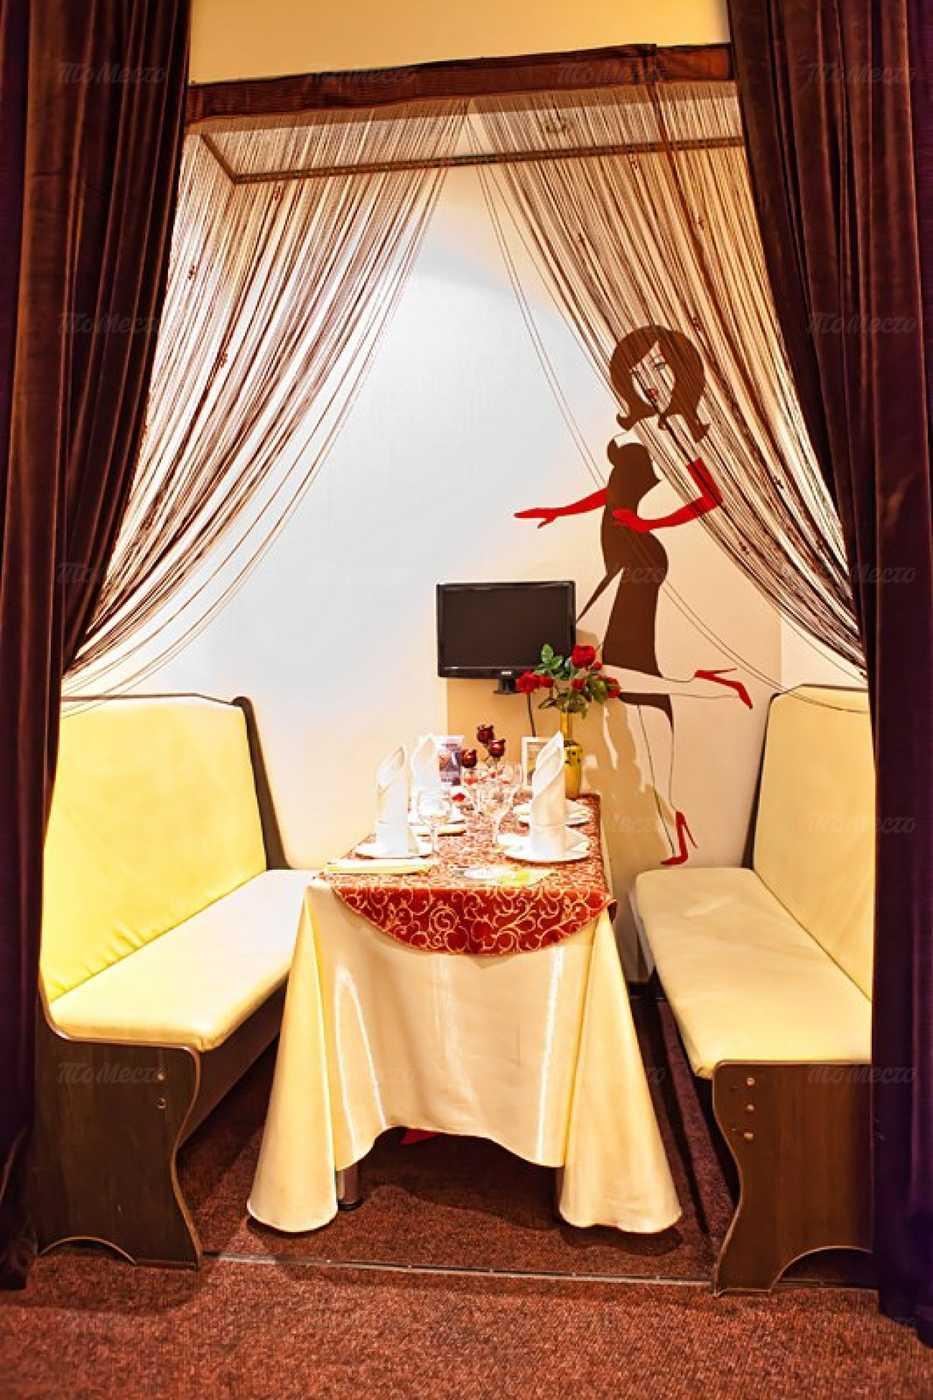 Меню ресторана Rest-Time (Рест Тайм) на проспекте Октября